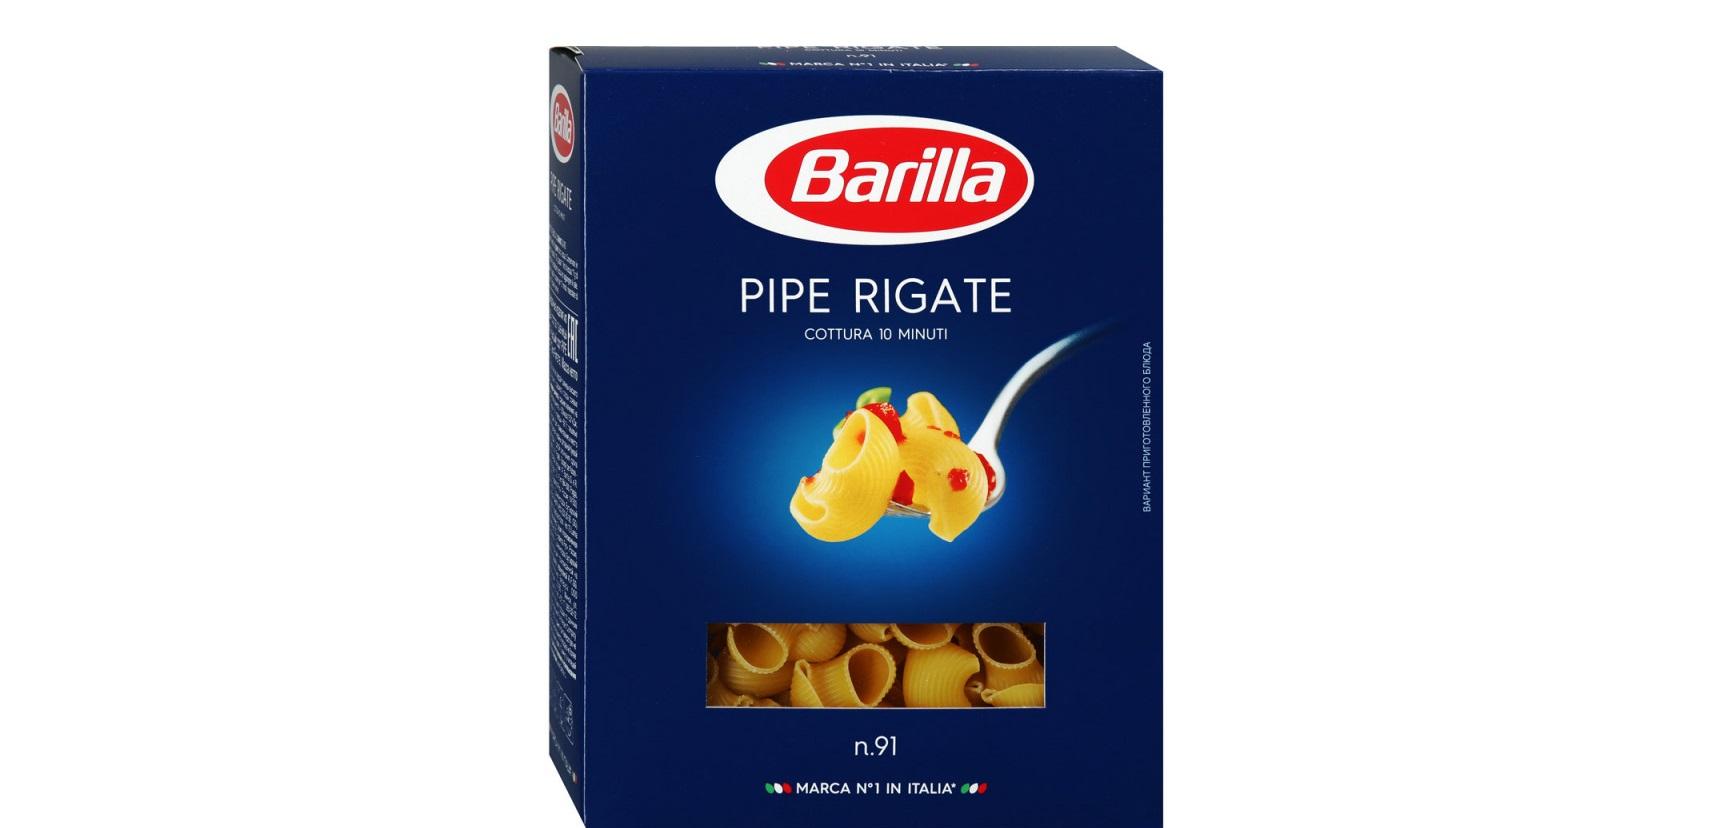 Макароны BARILLA улитки PIPI RIGATE, 450 гр